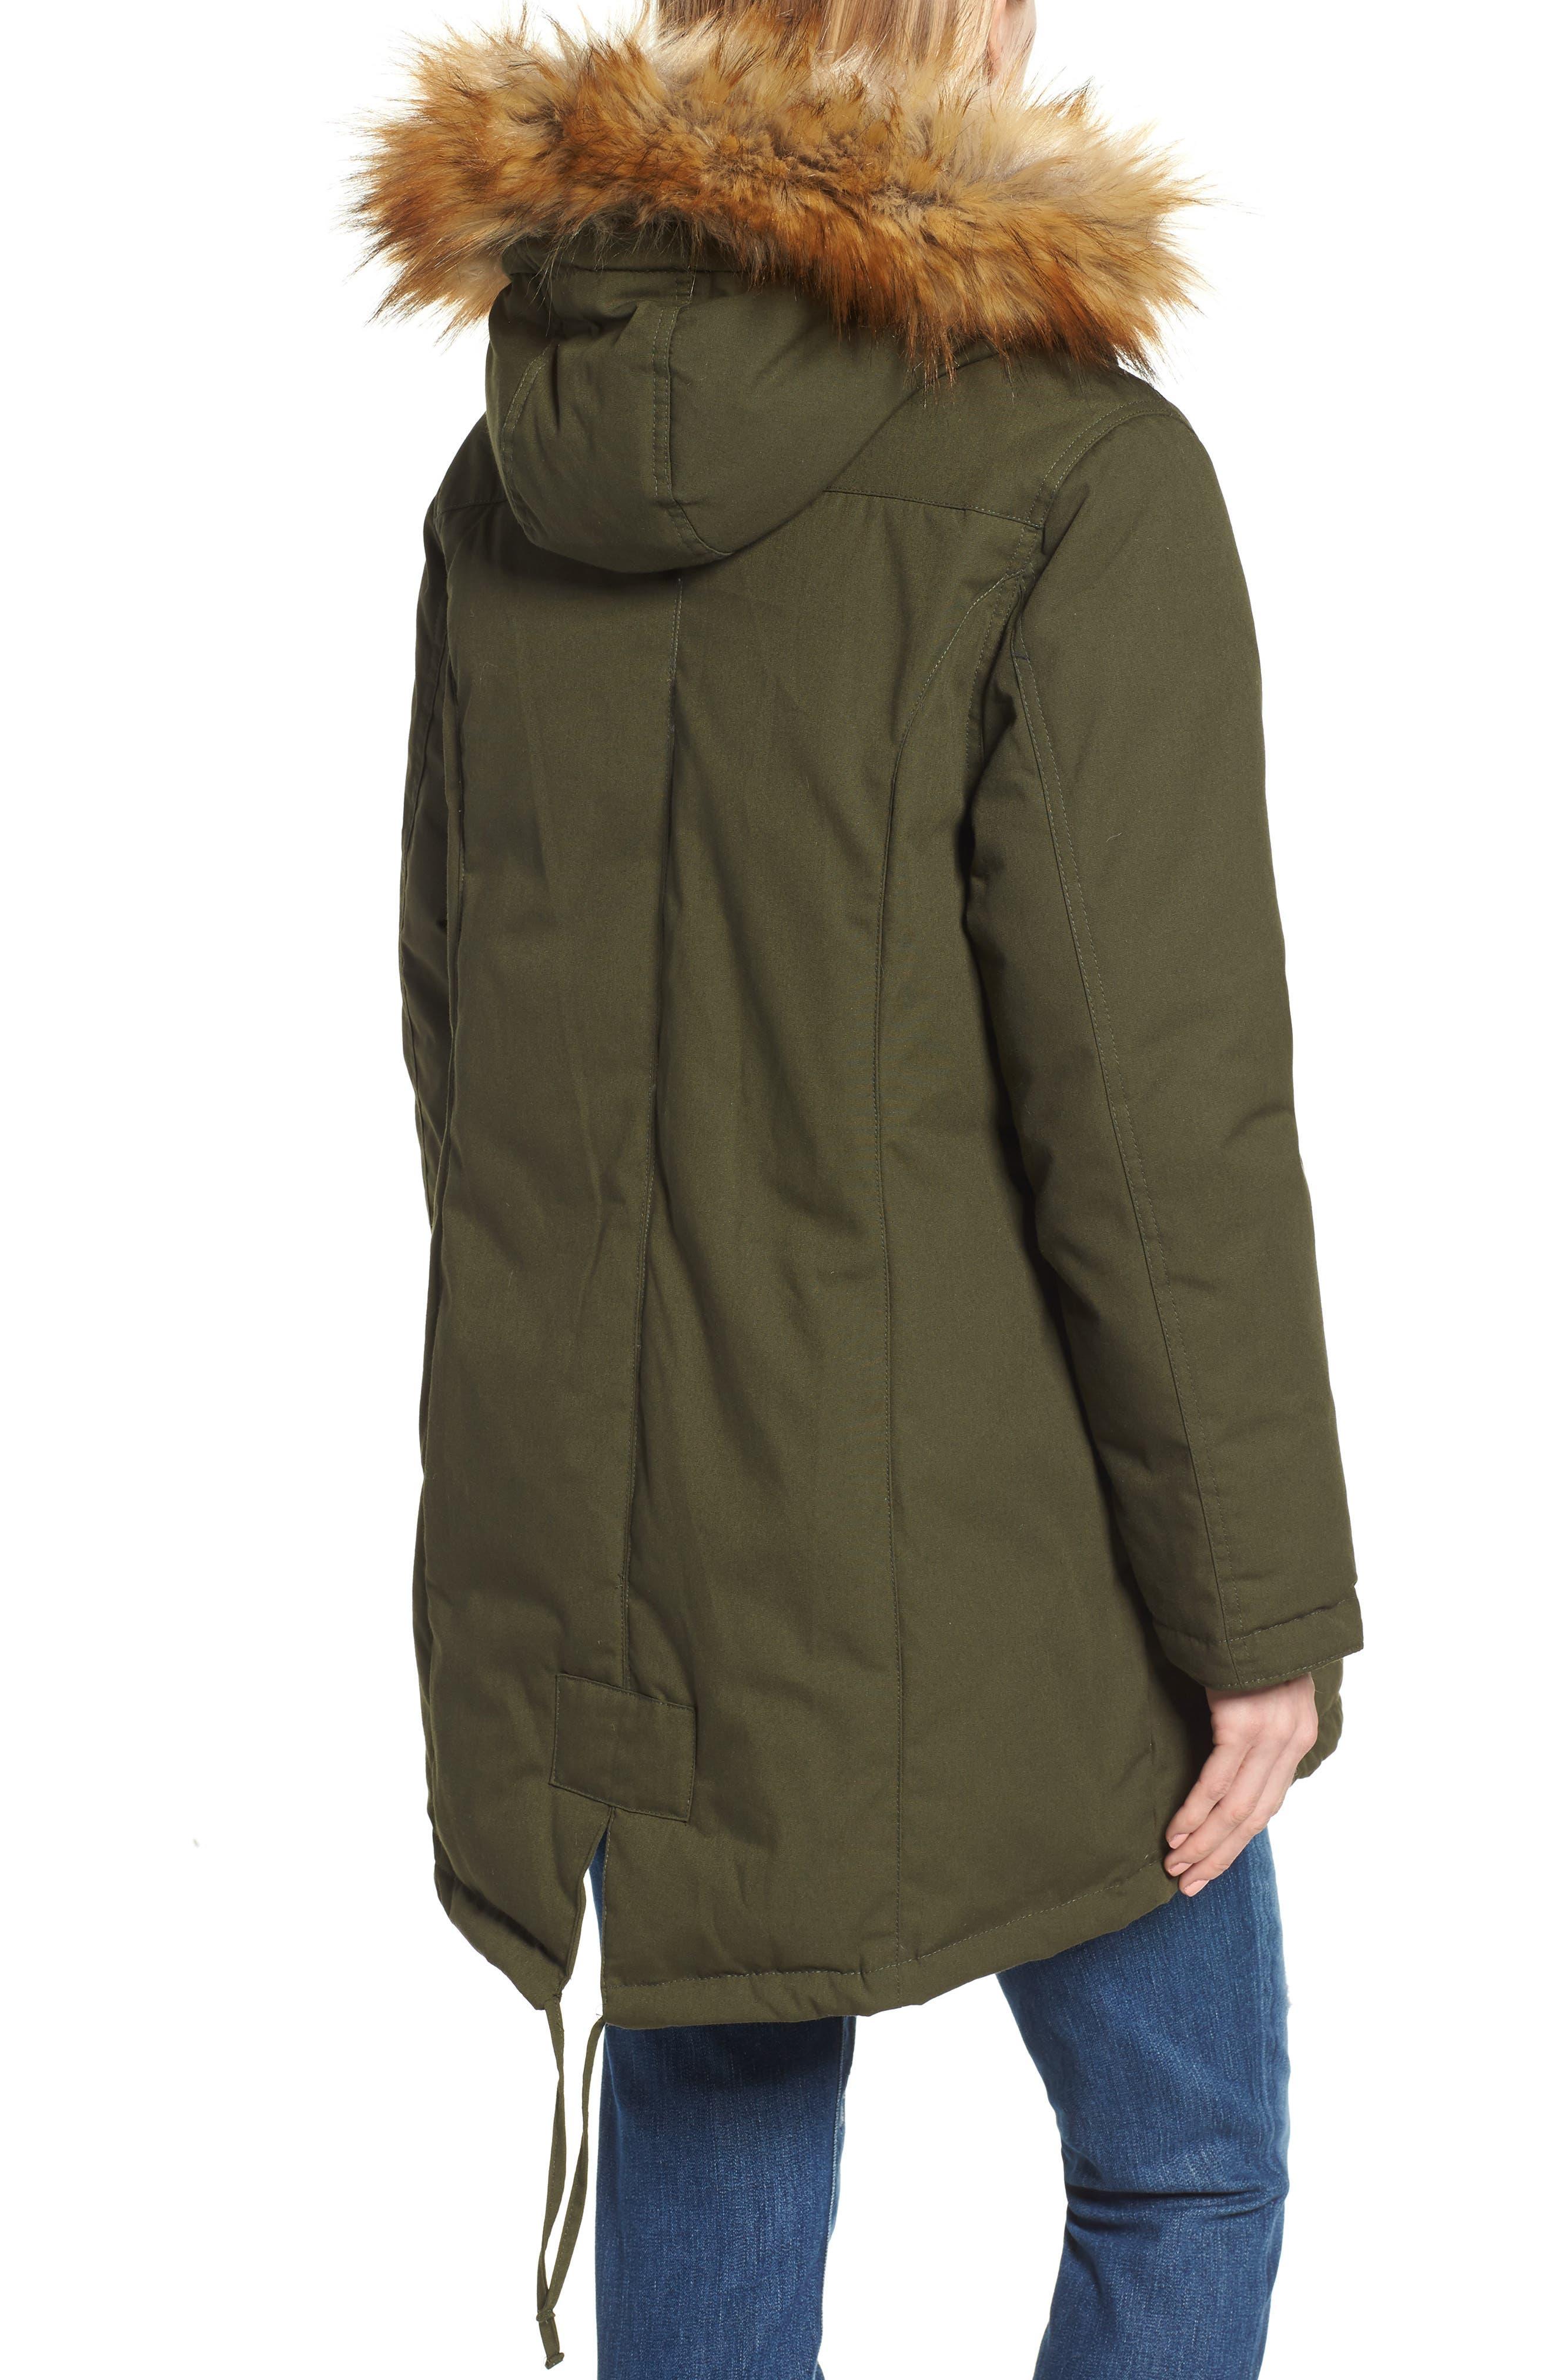 Convertible Down 3-in-1 Maternity Jacket,                             Alternate thumbnail 3, color,                             Khaki Green